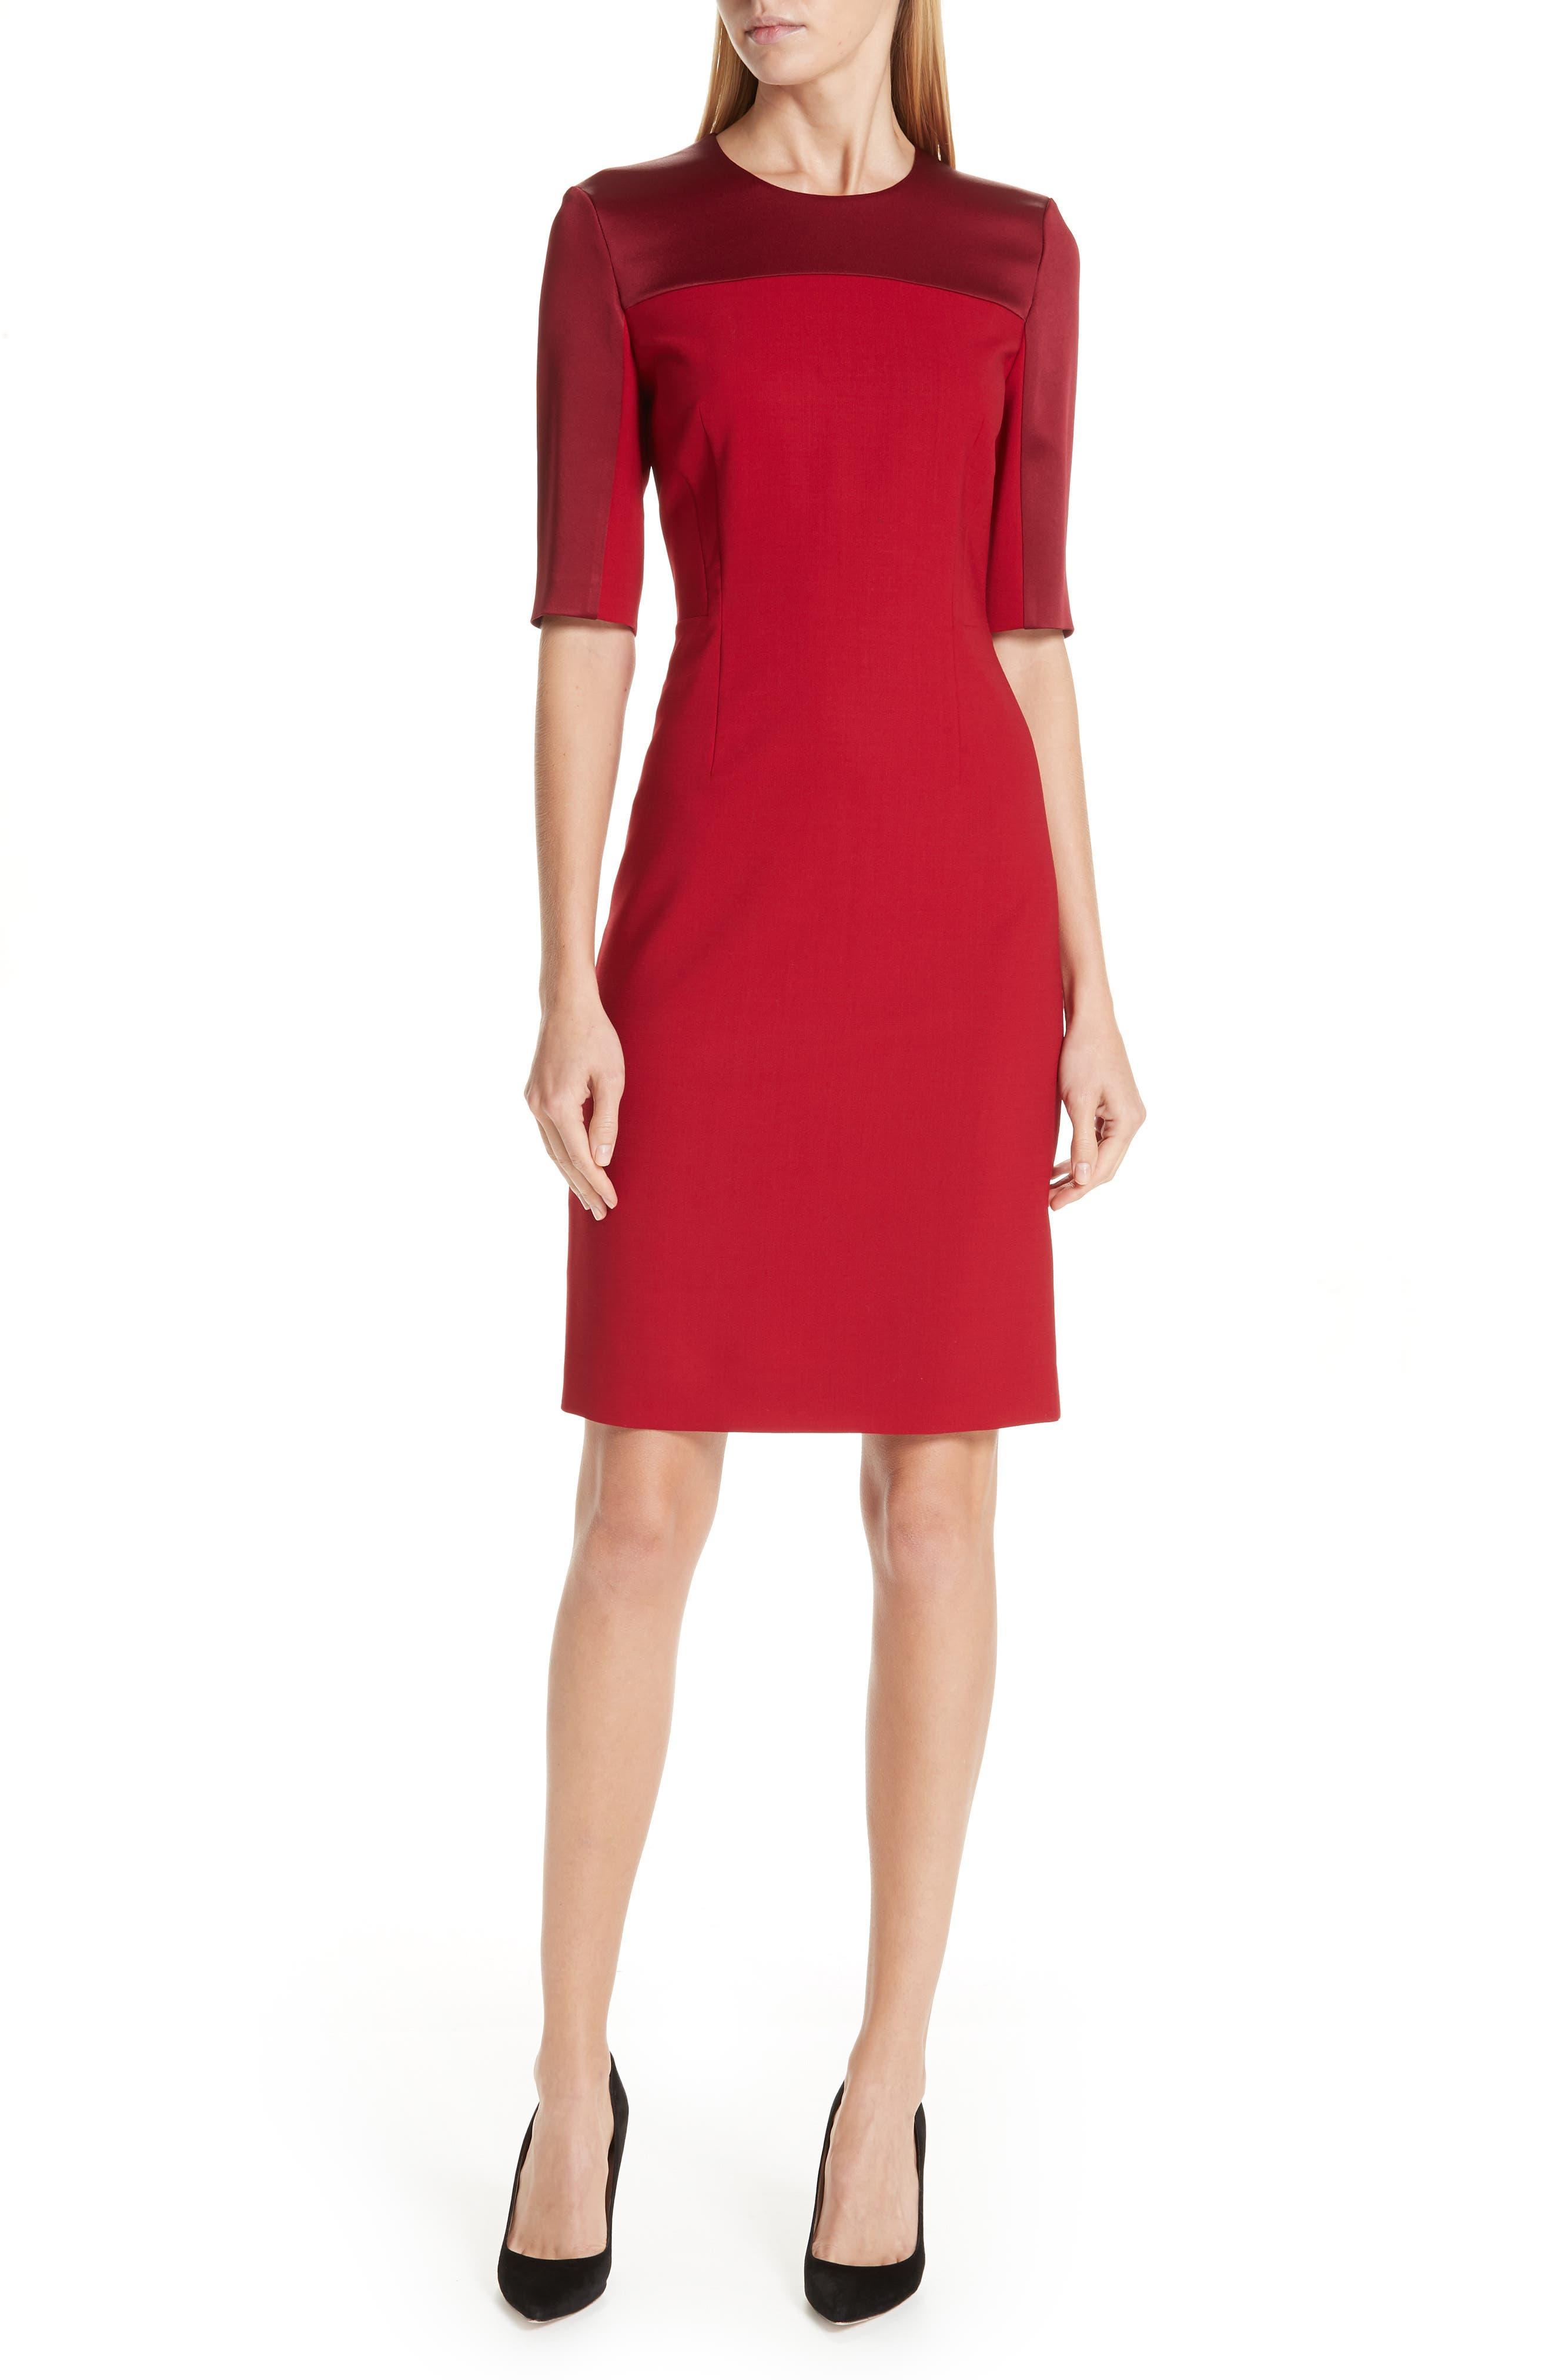 Danufa Stretch Wool Sheath Dress,                         Main,                         color, DARK RED